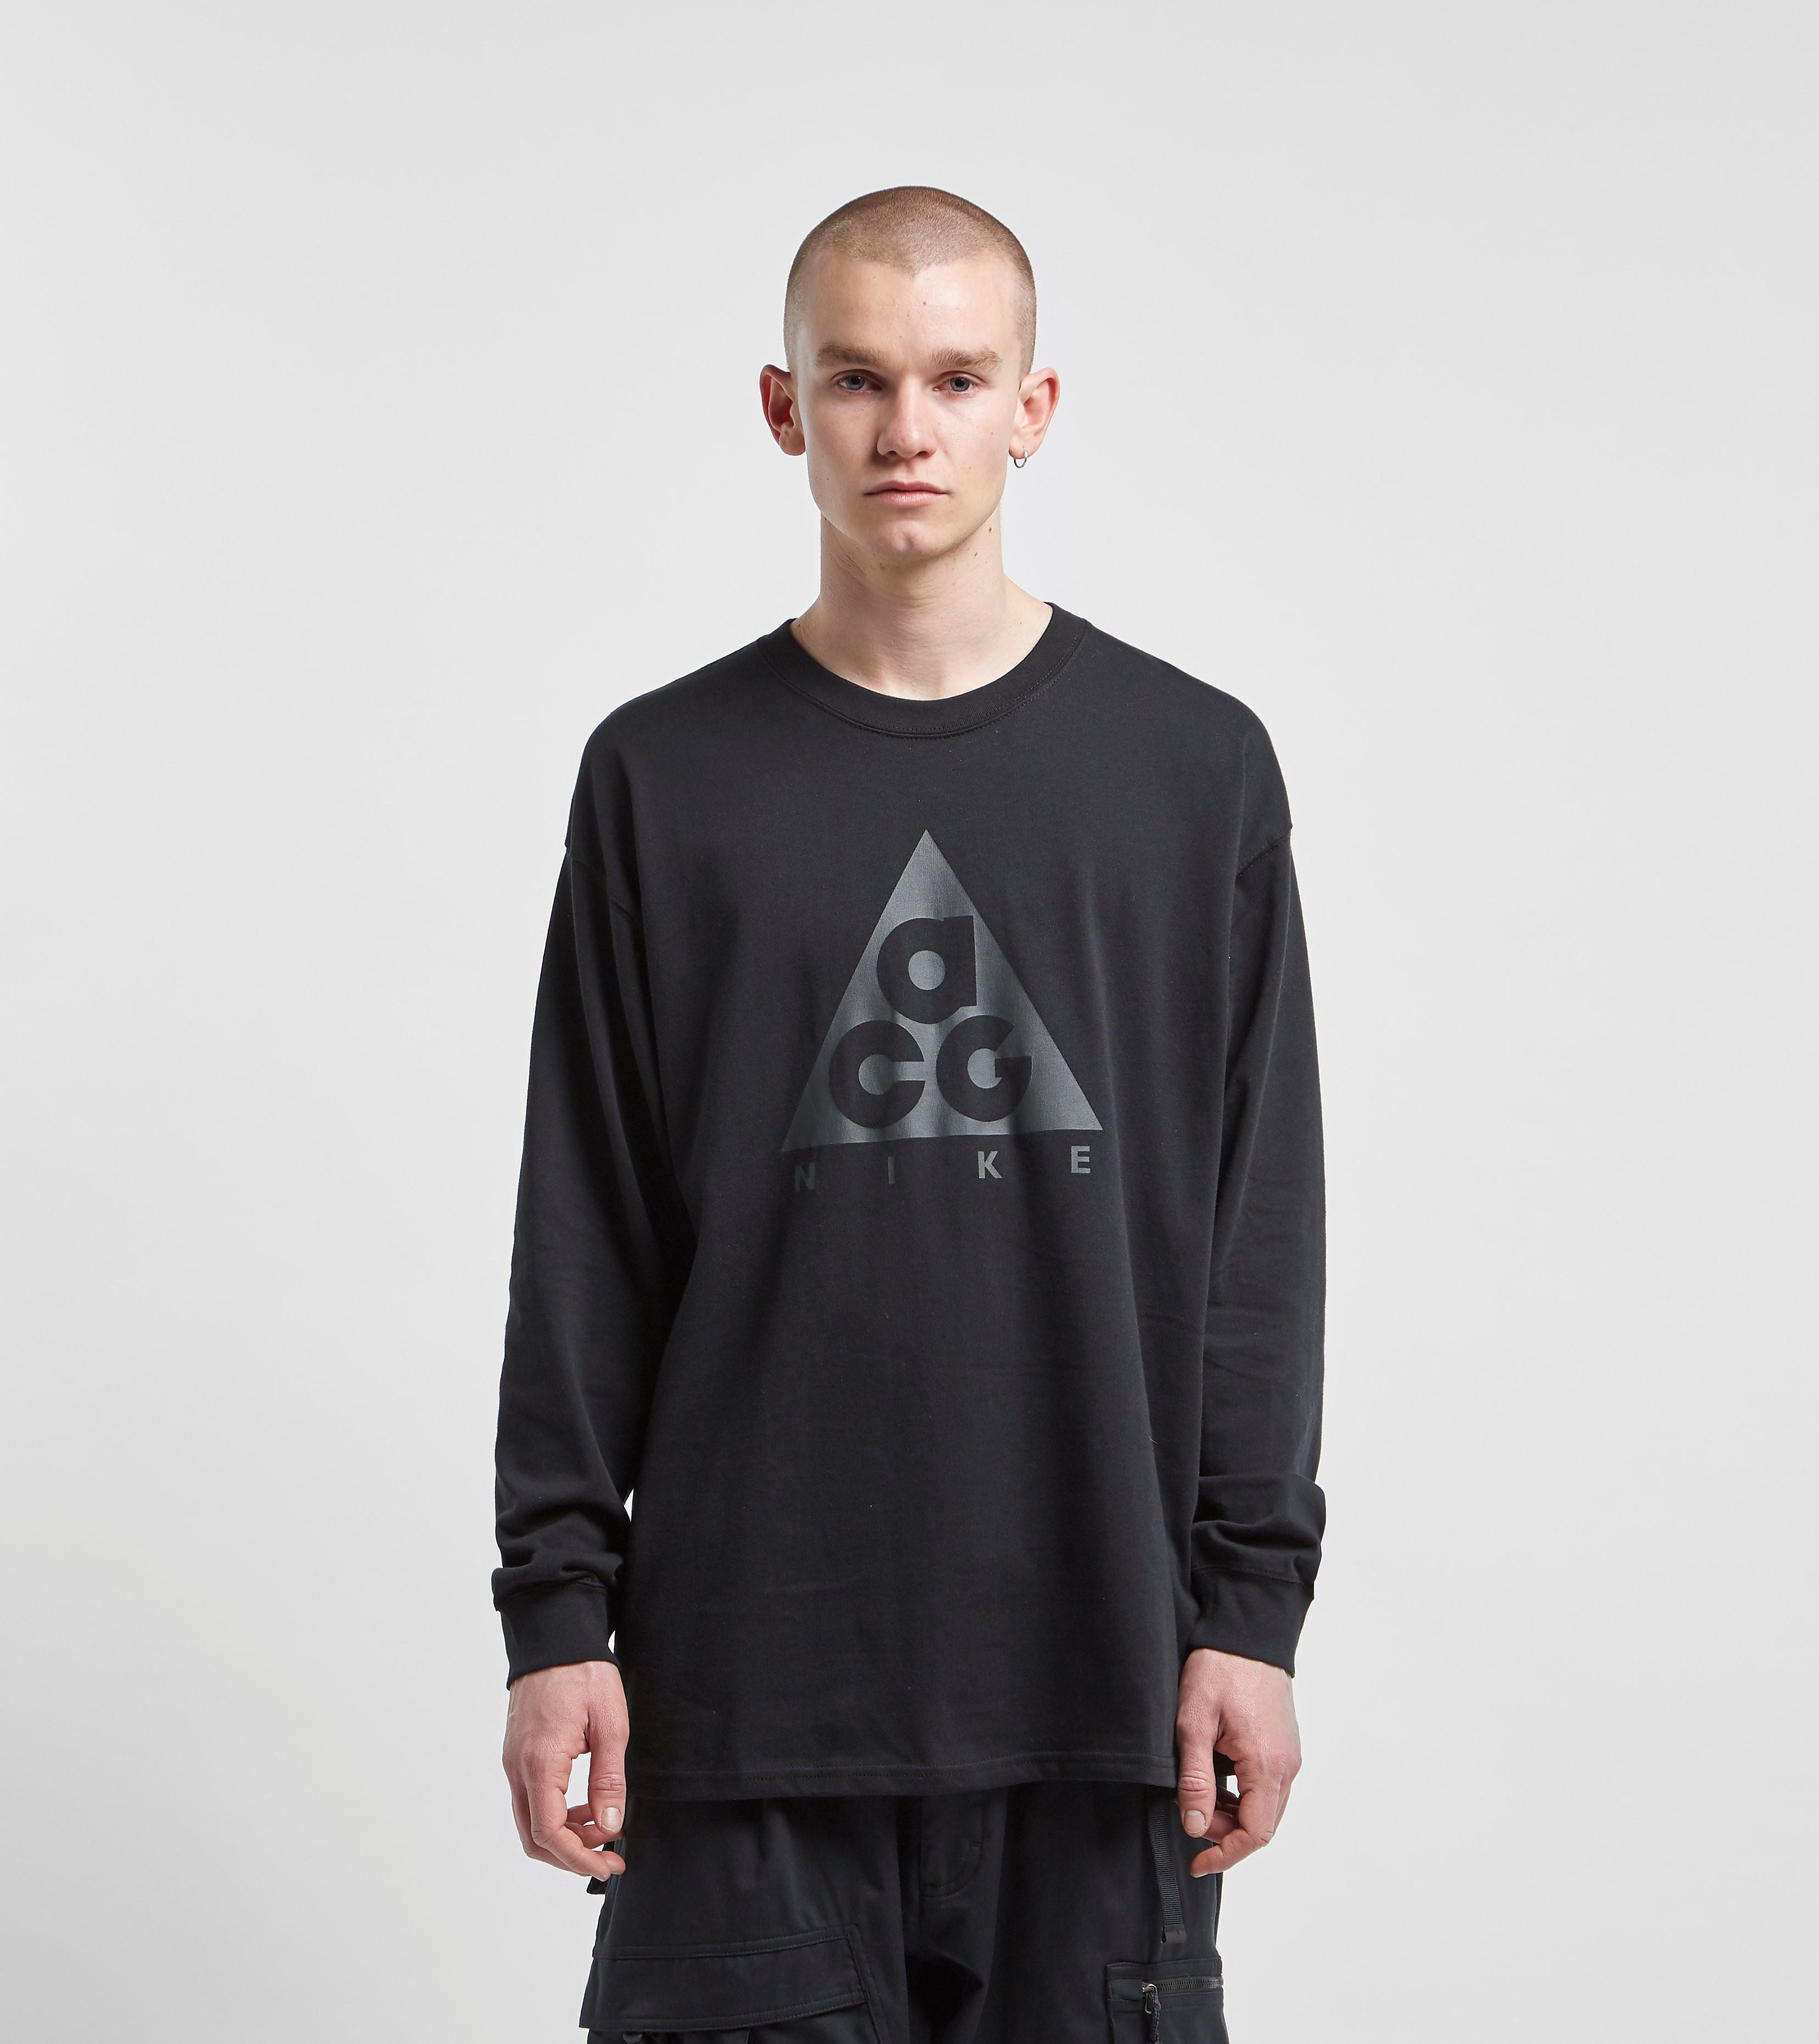 Nike ACG Long-Sleeved T-Shirt